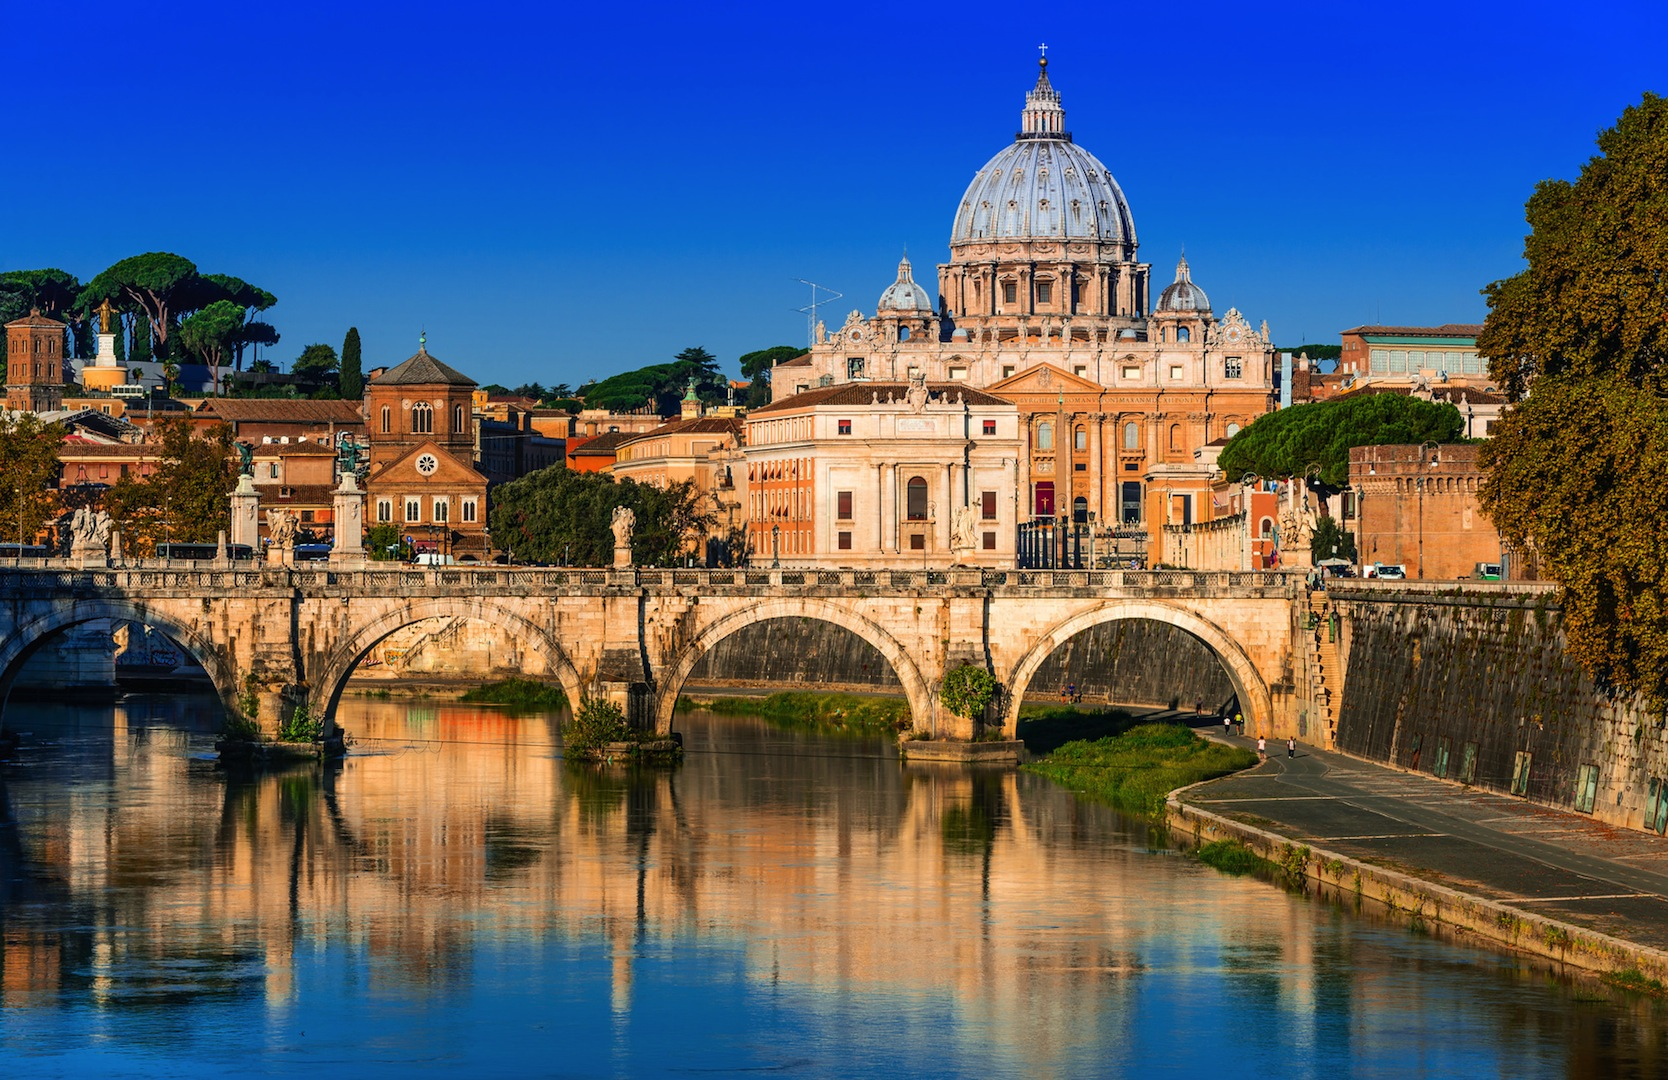 Rome, Italy. Vatican dome of San Pietro and Sant Angelo Bridge, over Tiber river.